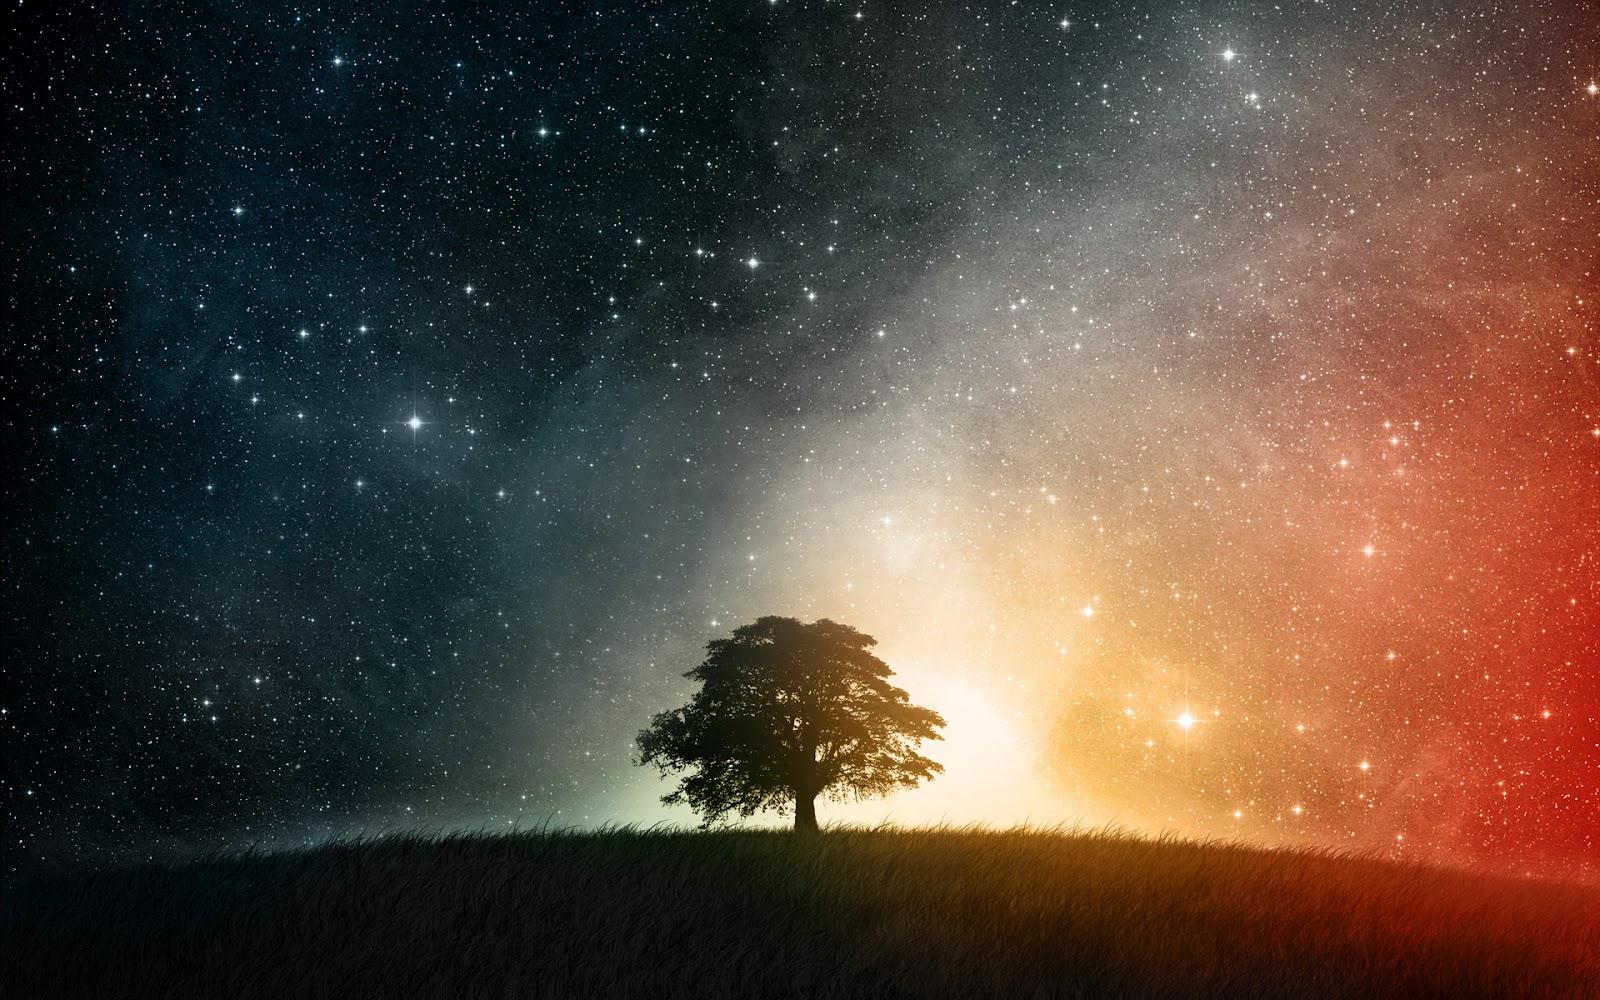 wallpapers hd night sky 1600x1000